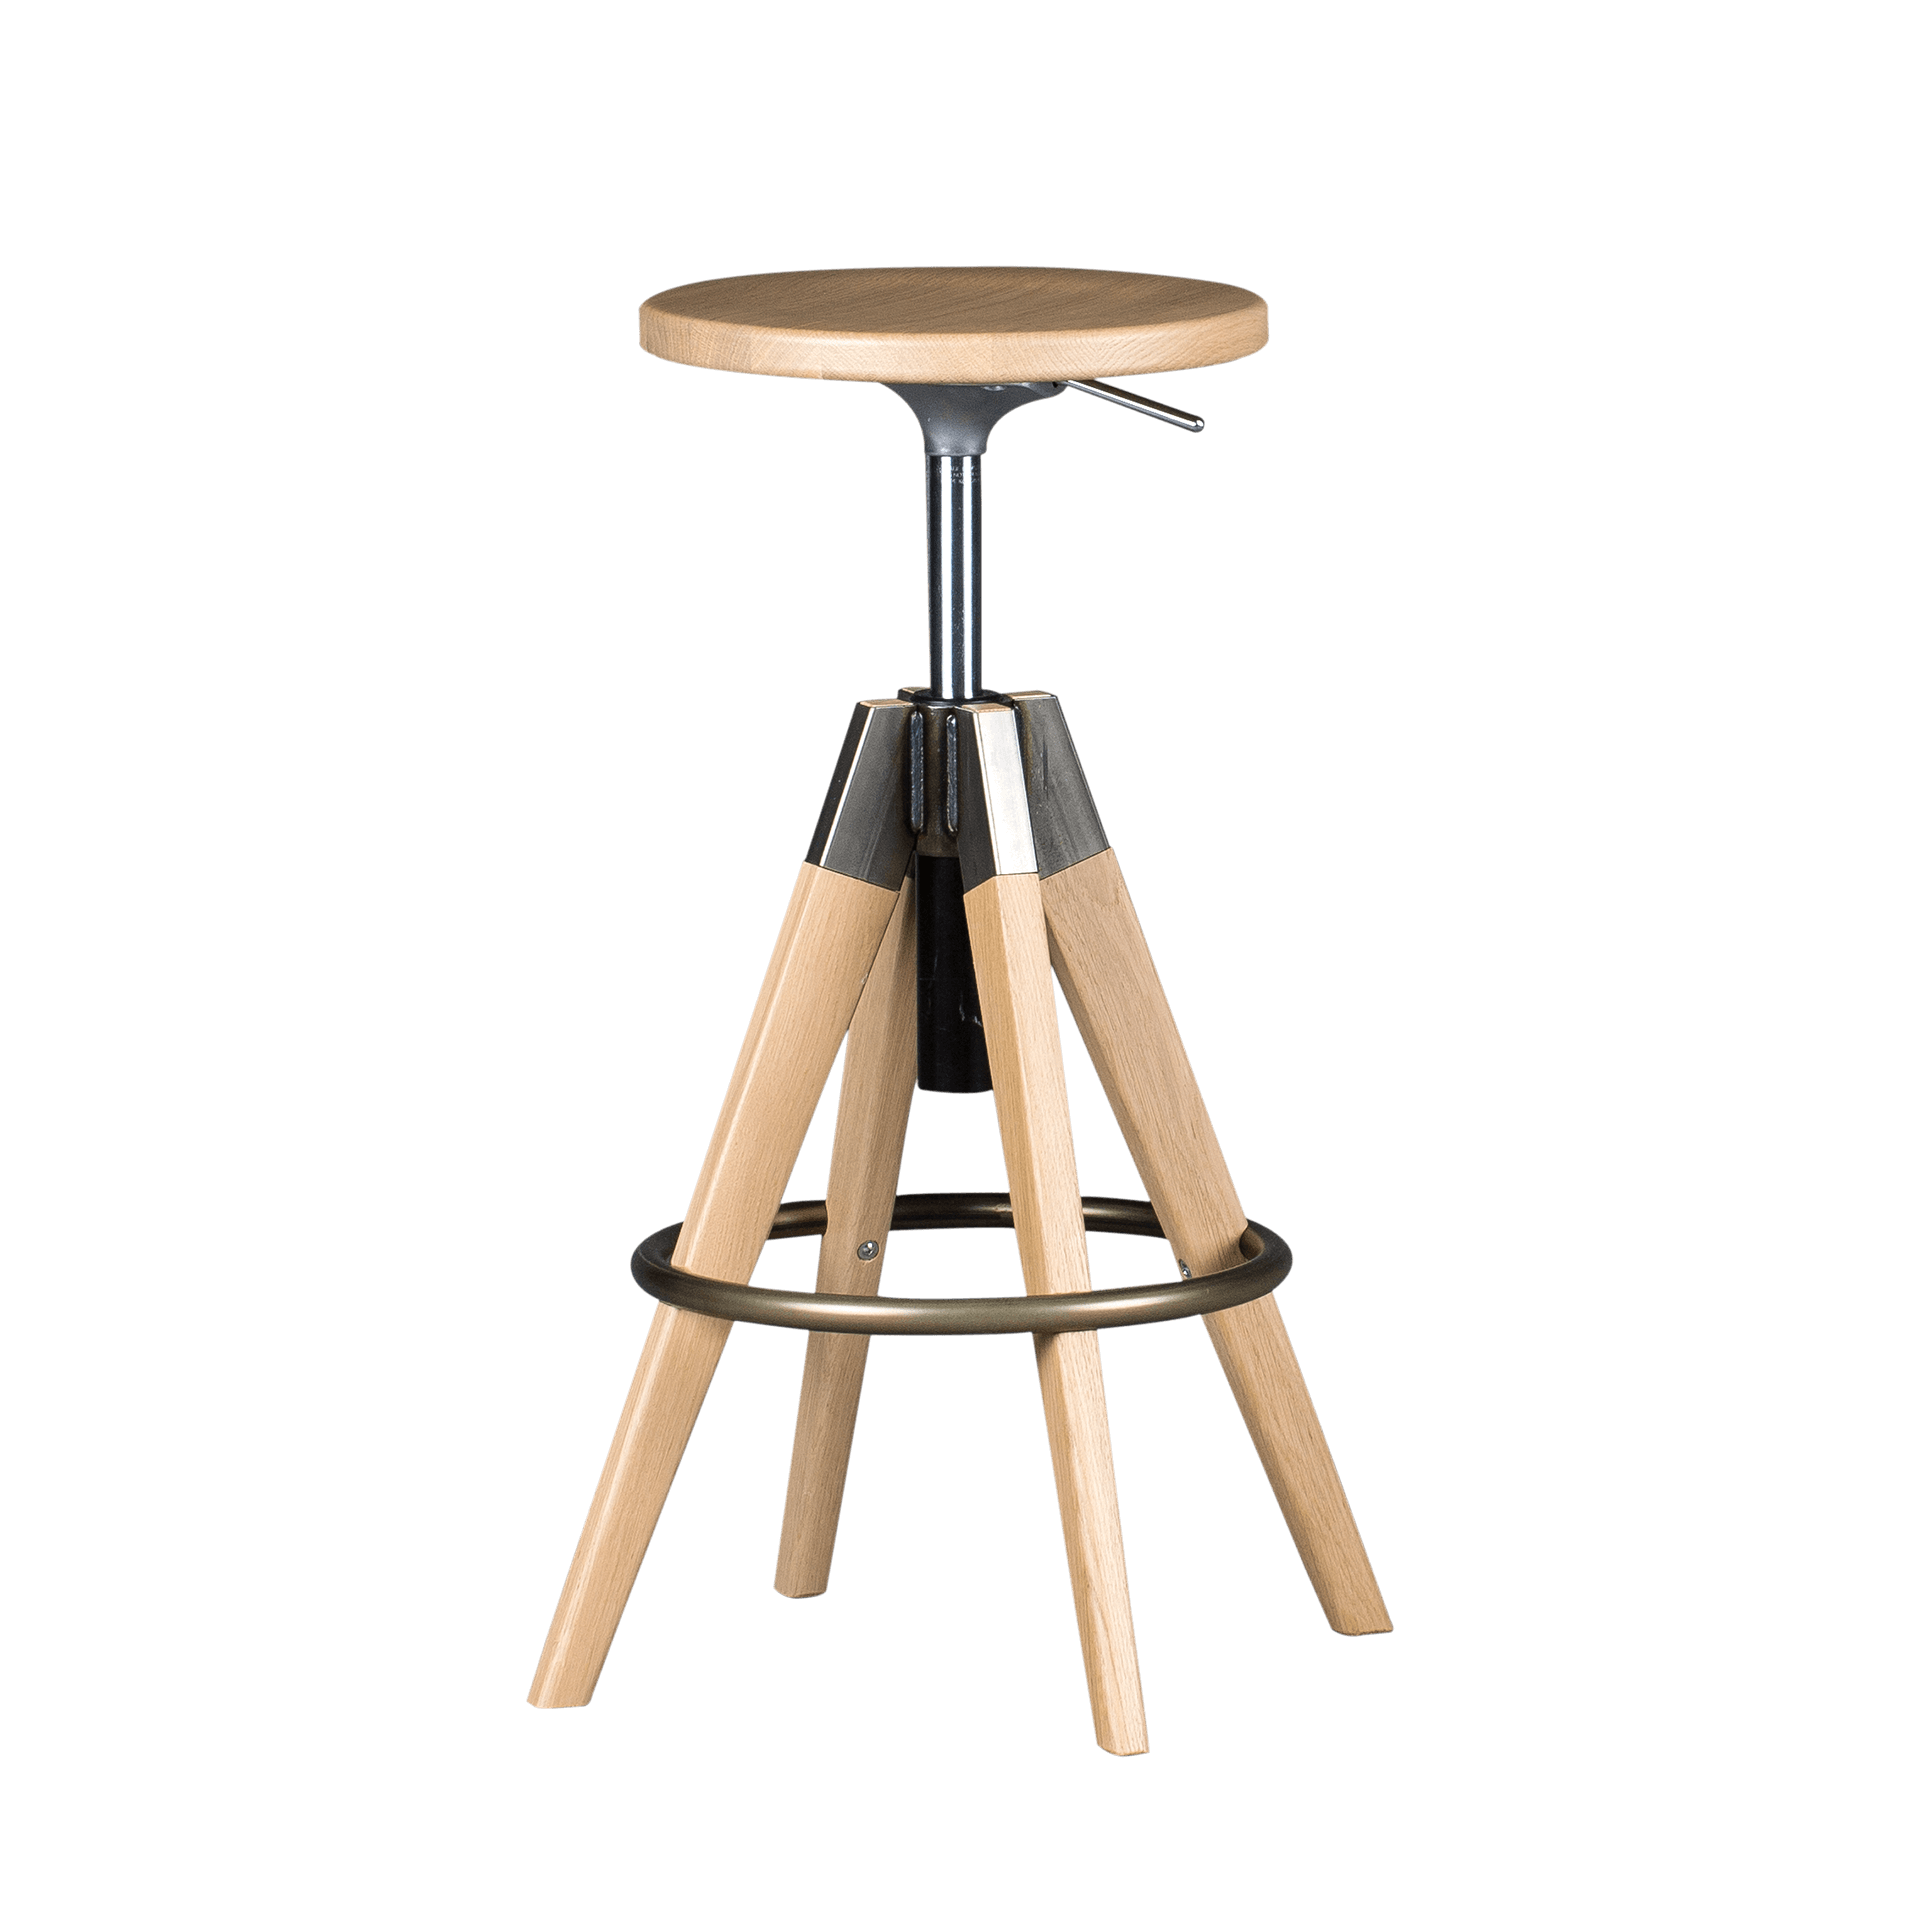 arki stool barhocker preis